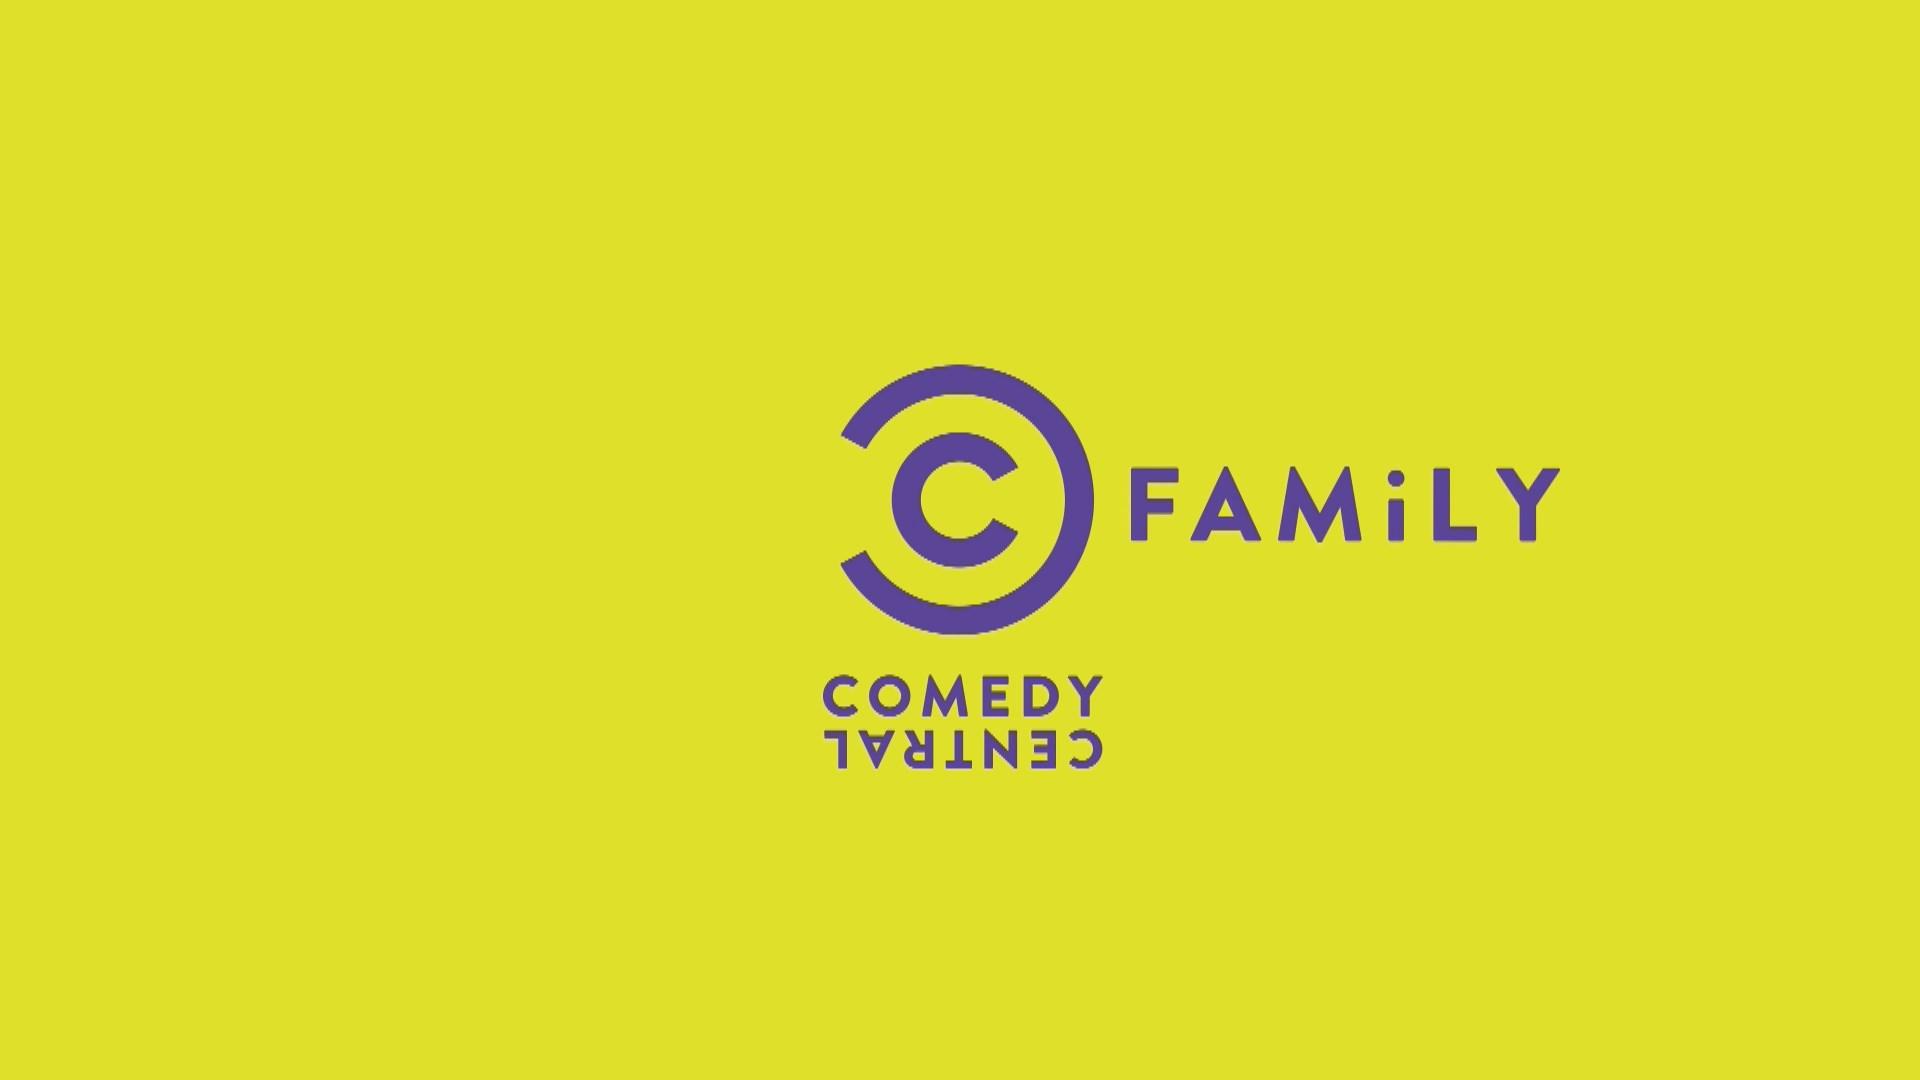 comedy_central_family_cover.jpg